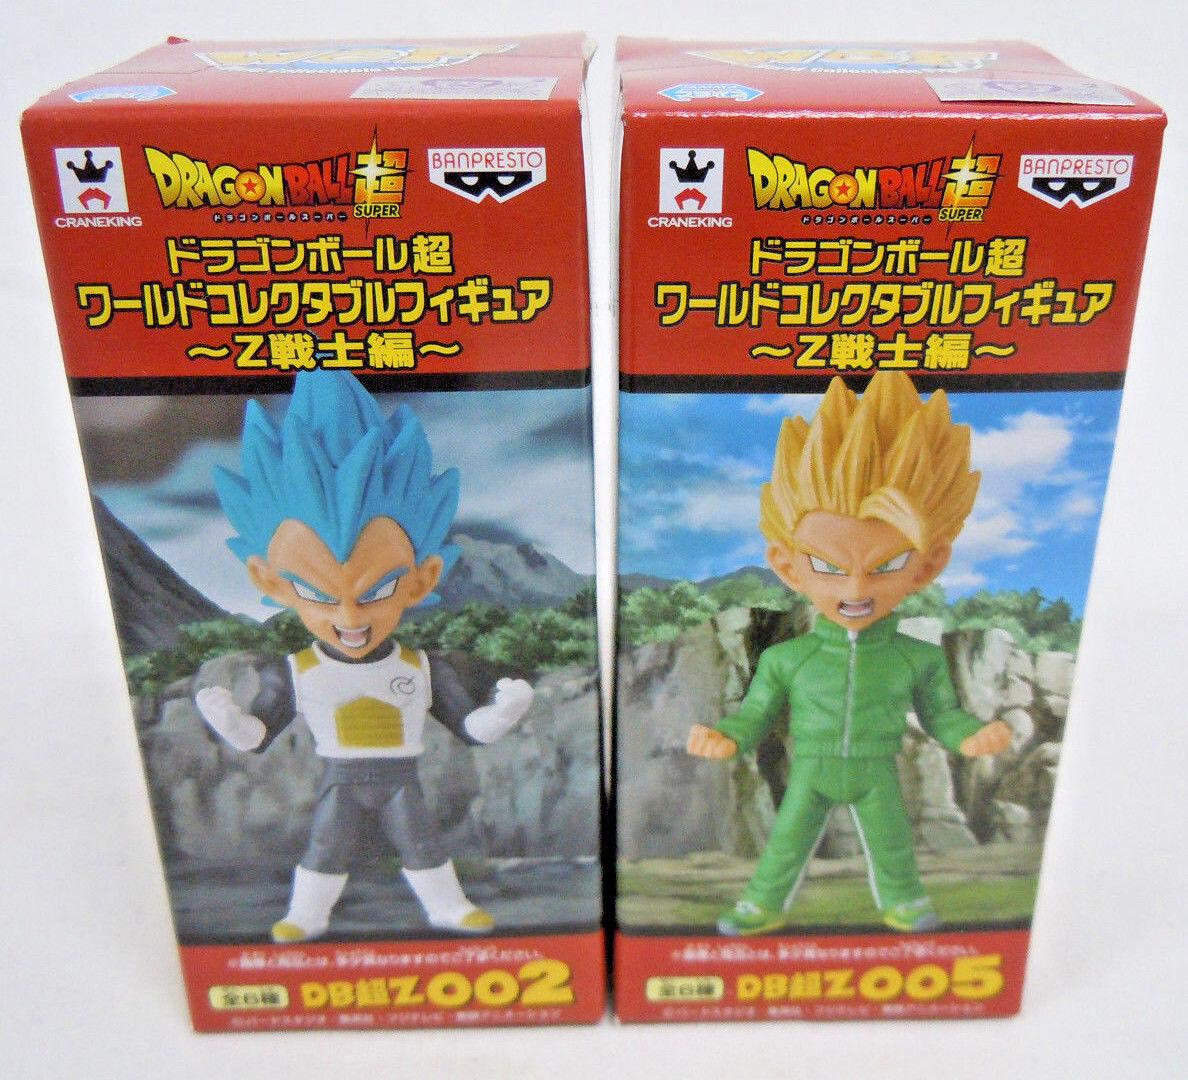 Banpresto Dragon Ball Z 2.8-Inch Super Saiyan God Super Saiy